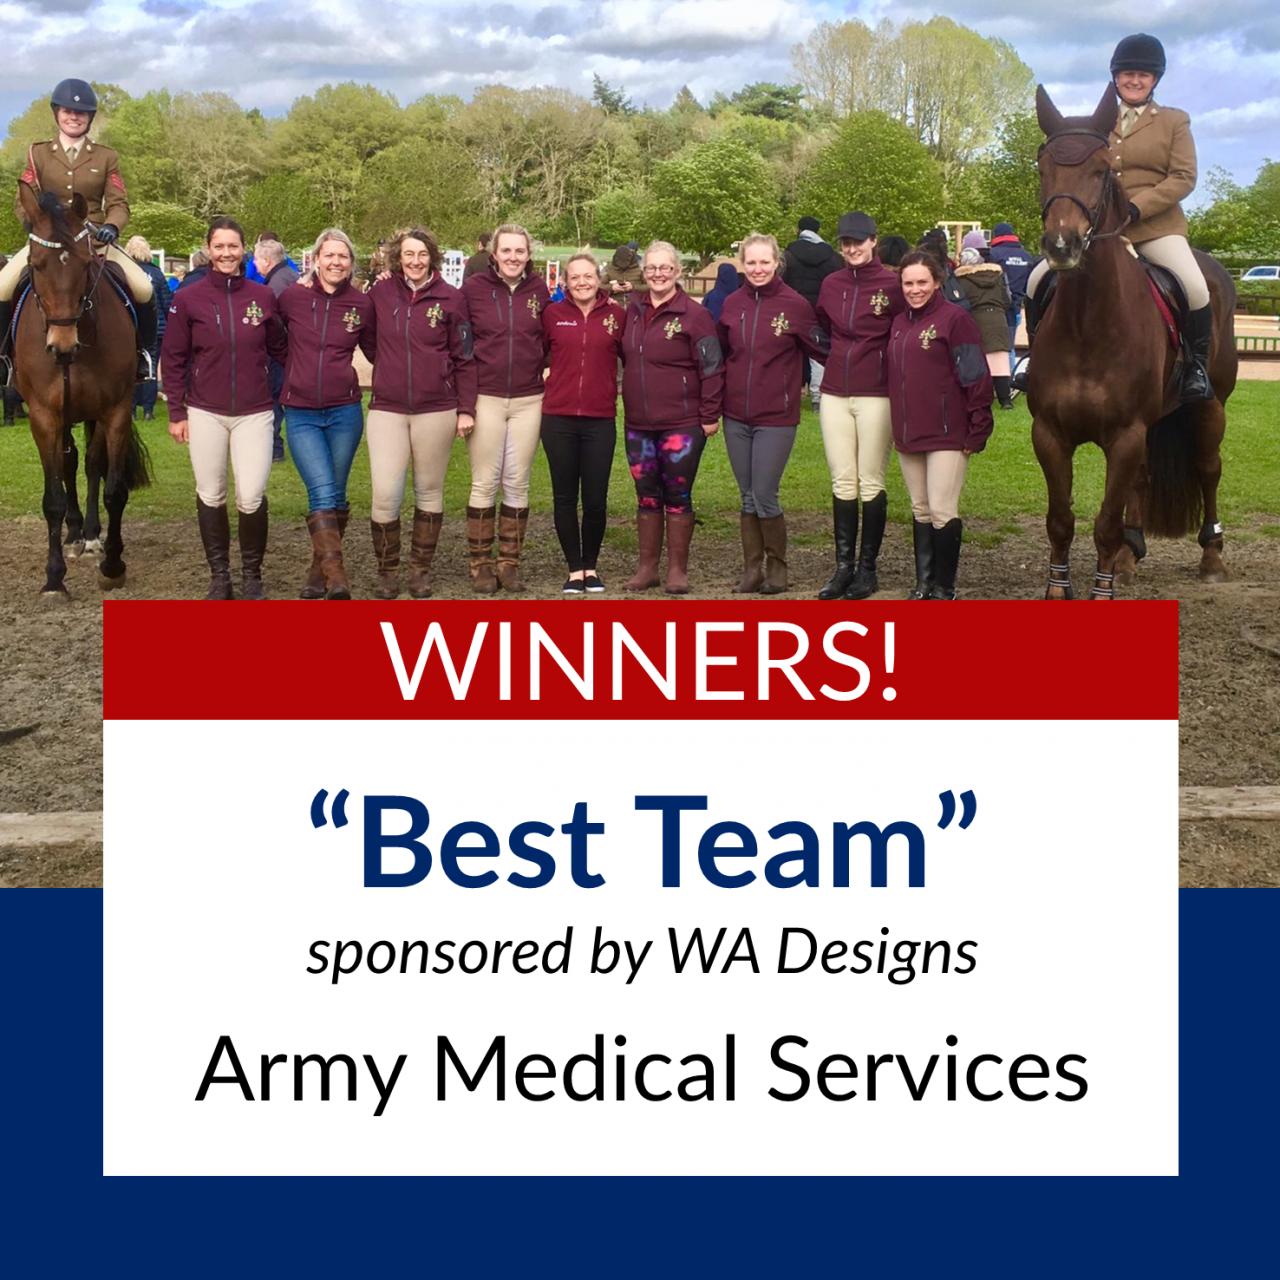 Winner of the Best Team sponsored by WA Designs is......